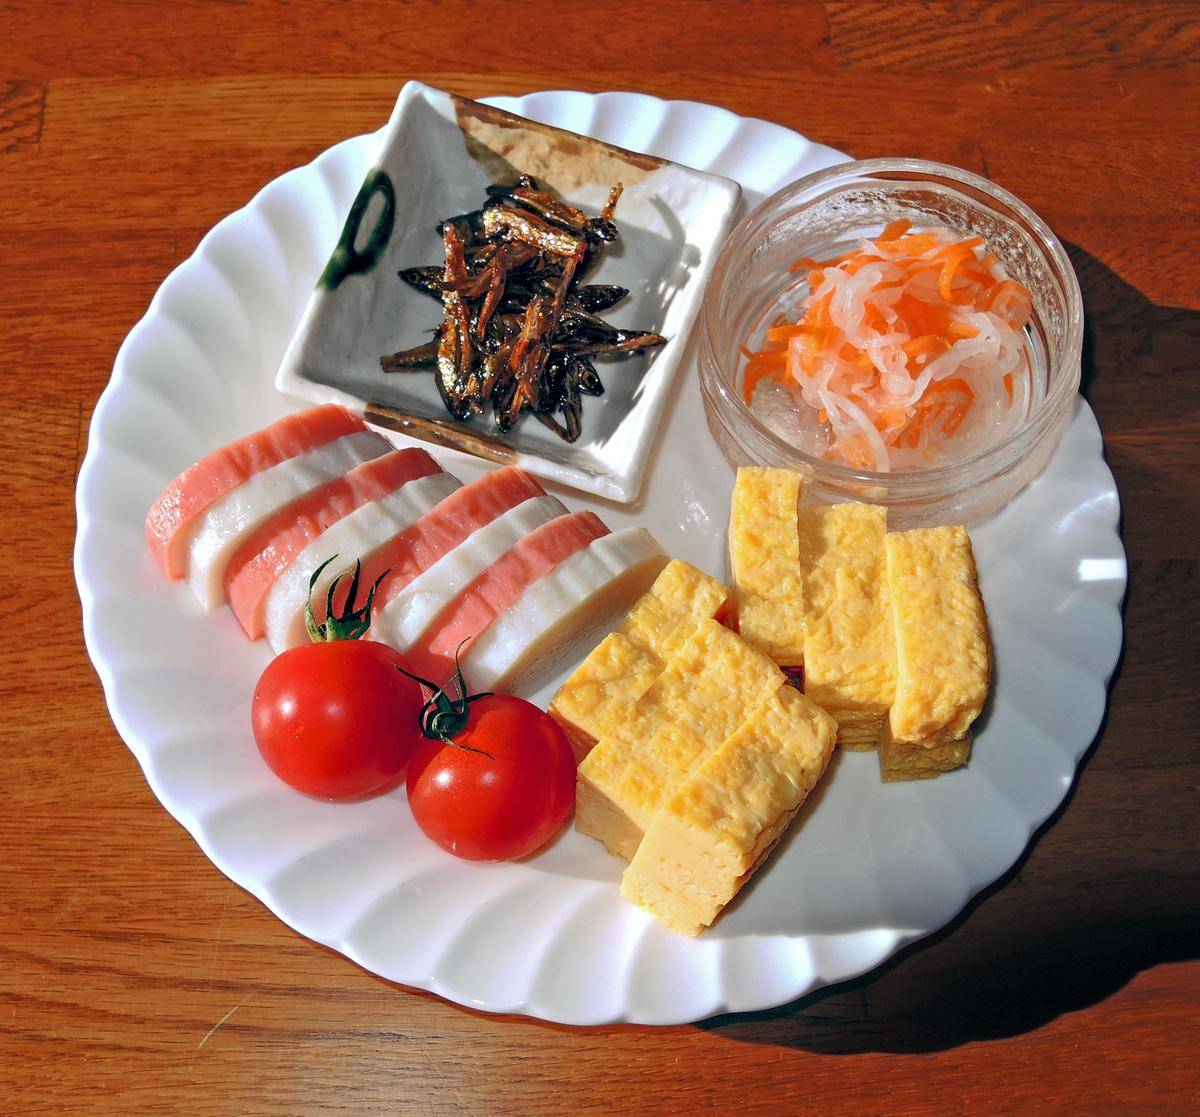 f:id:sashimi-fish1:20200117172933j:image:w210:left